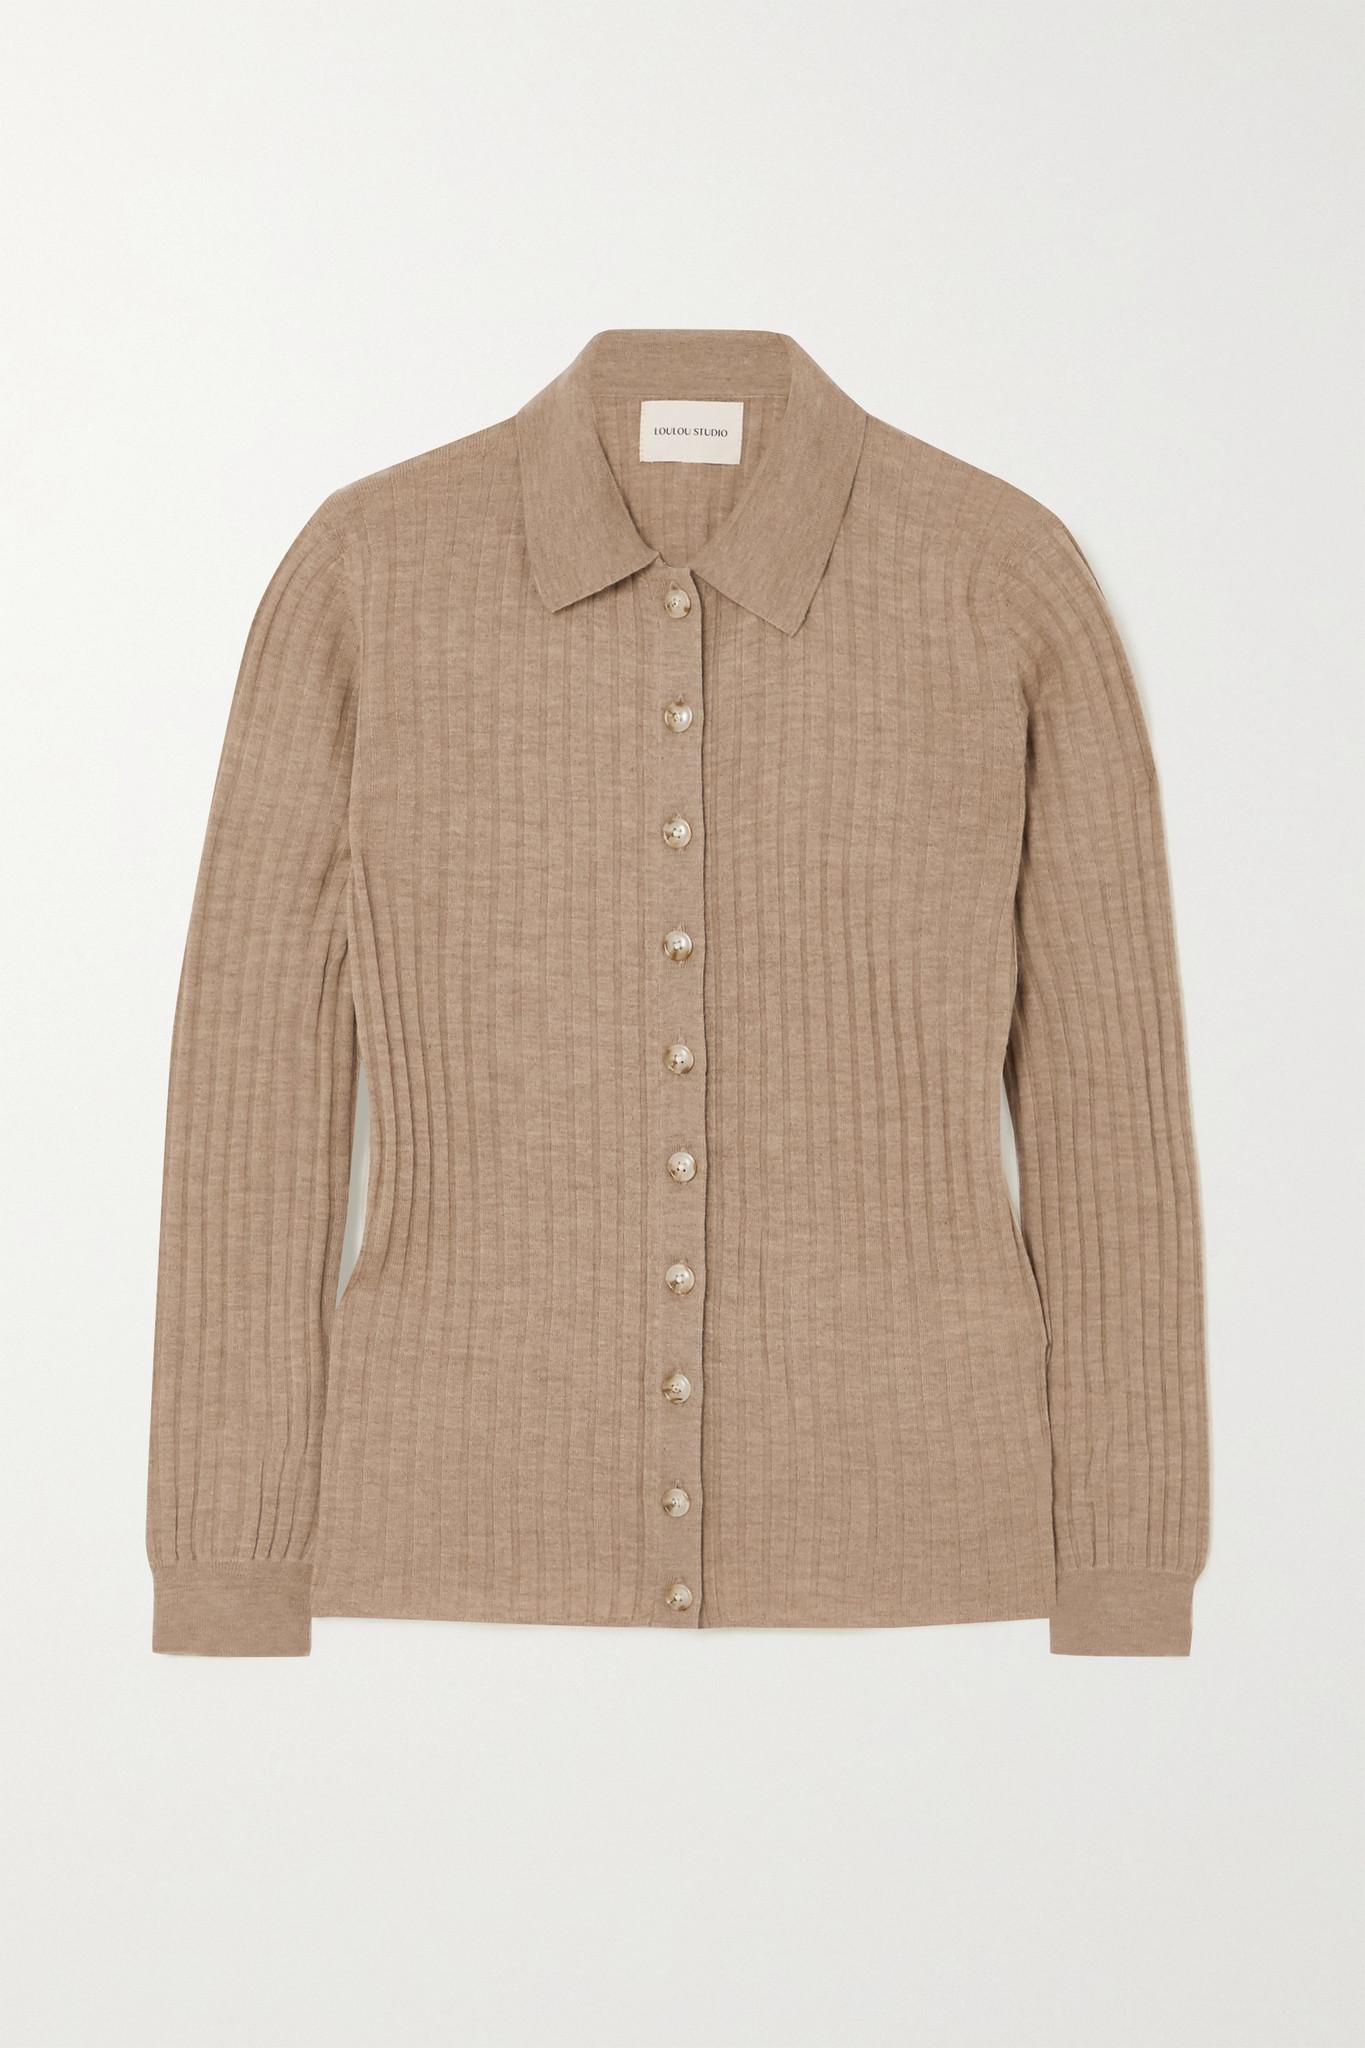 LOULOU STUDIO - Sulug 罗纹混色羊毛羊绒混纺毛衣 - 棕色 - x small